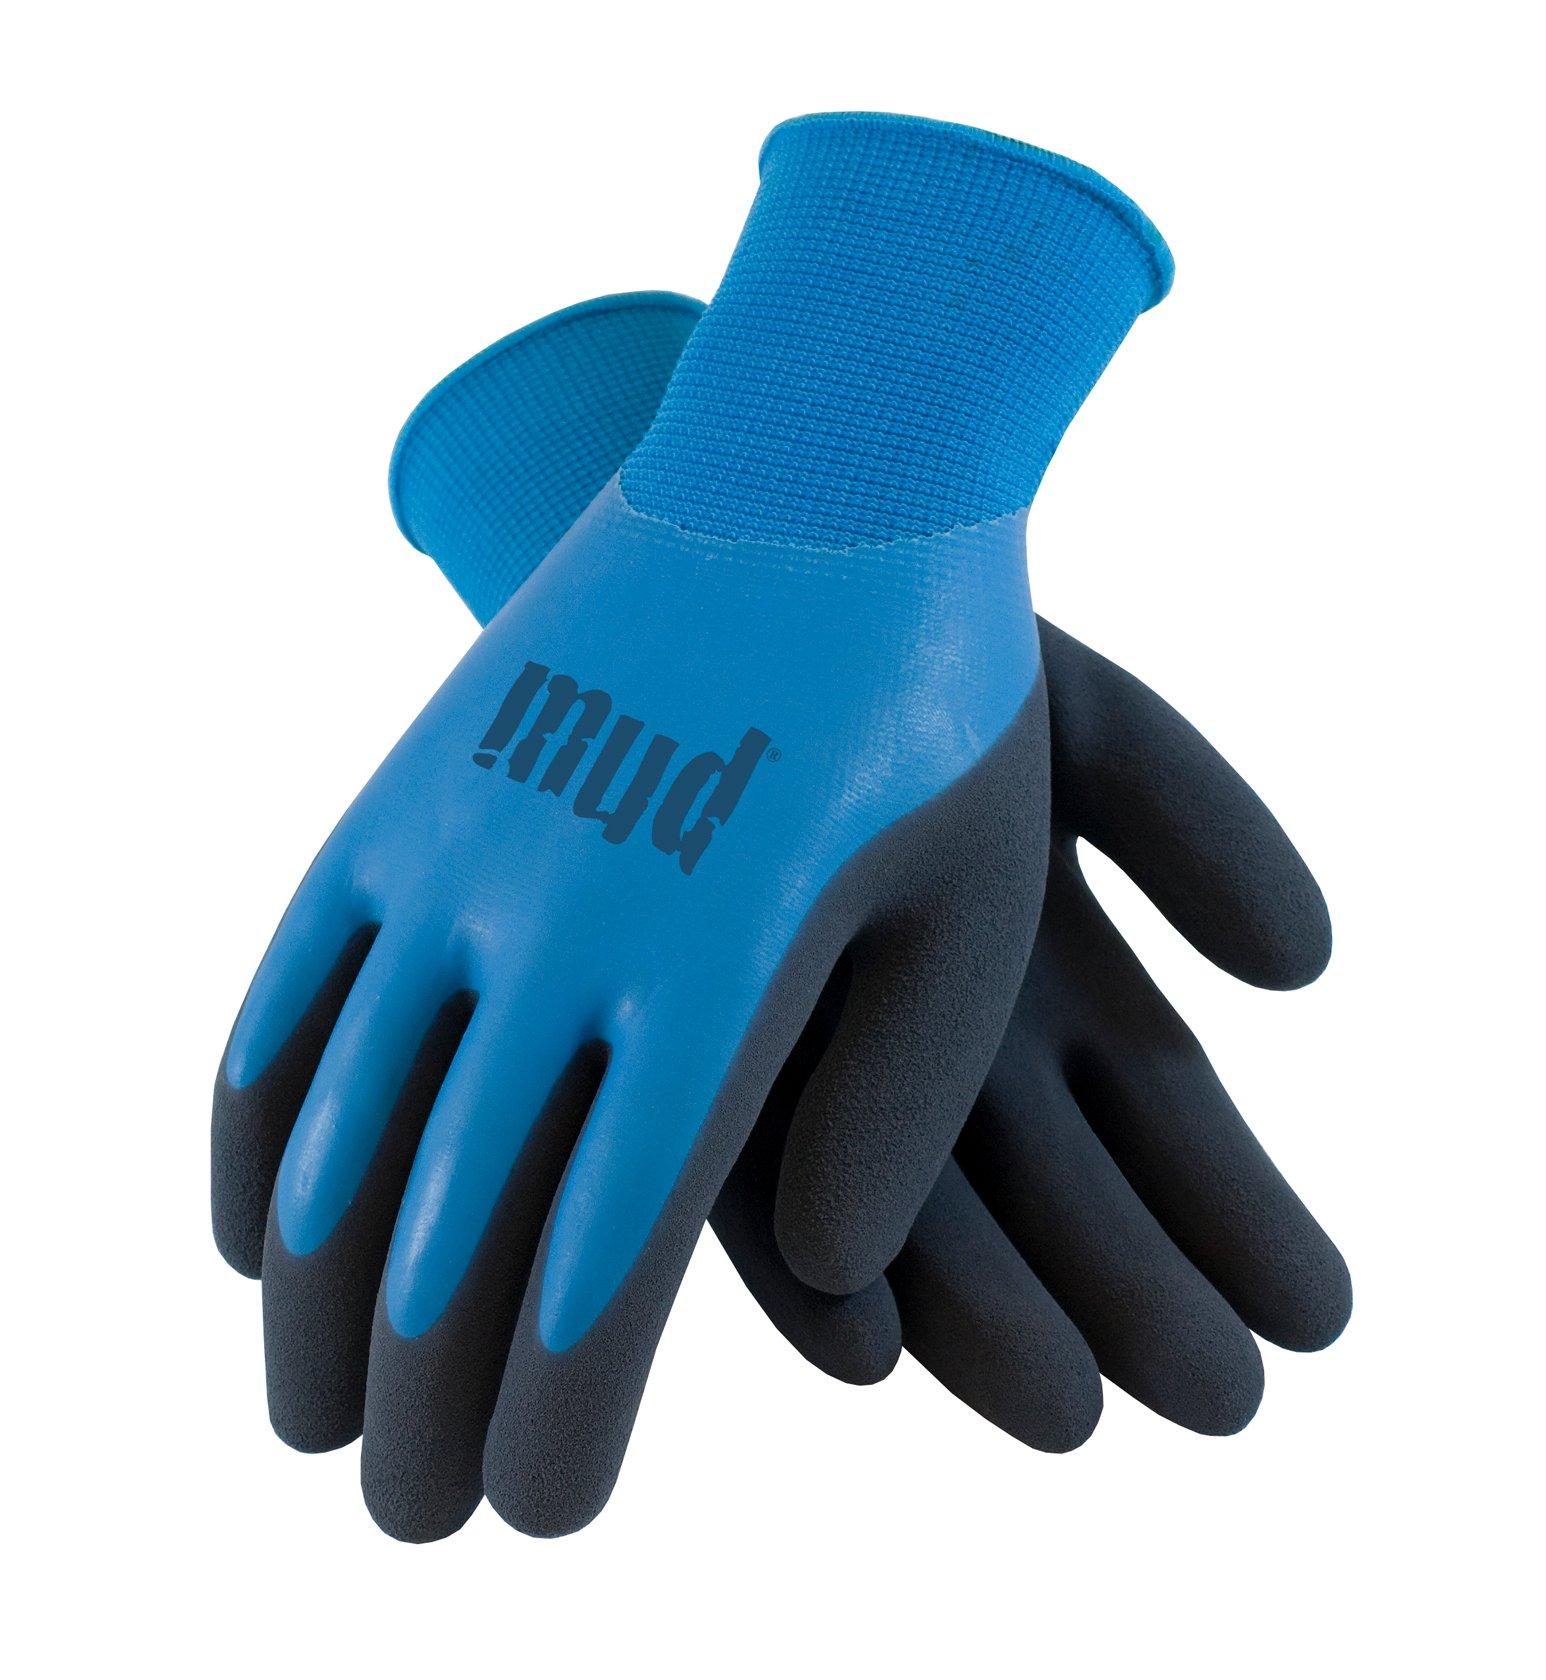 MUD 027B/L Mud H2O Garden Glove, Large, Blue Azure